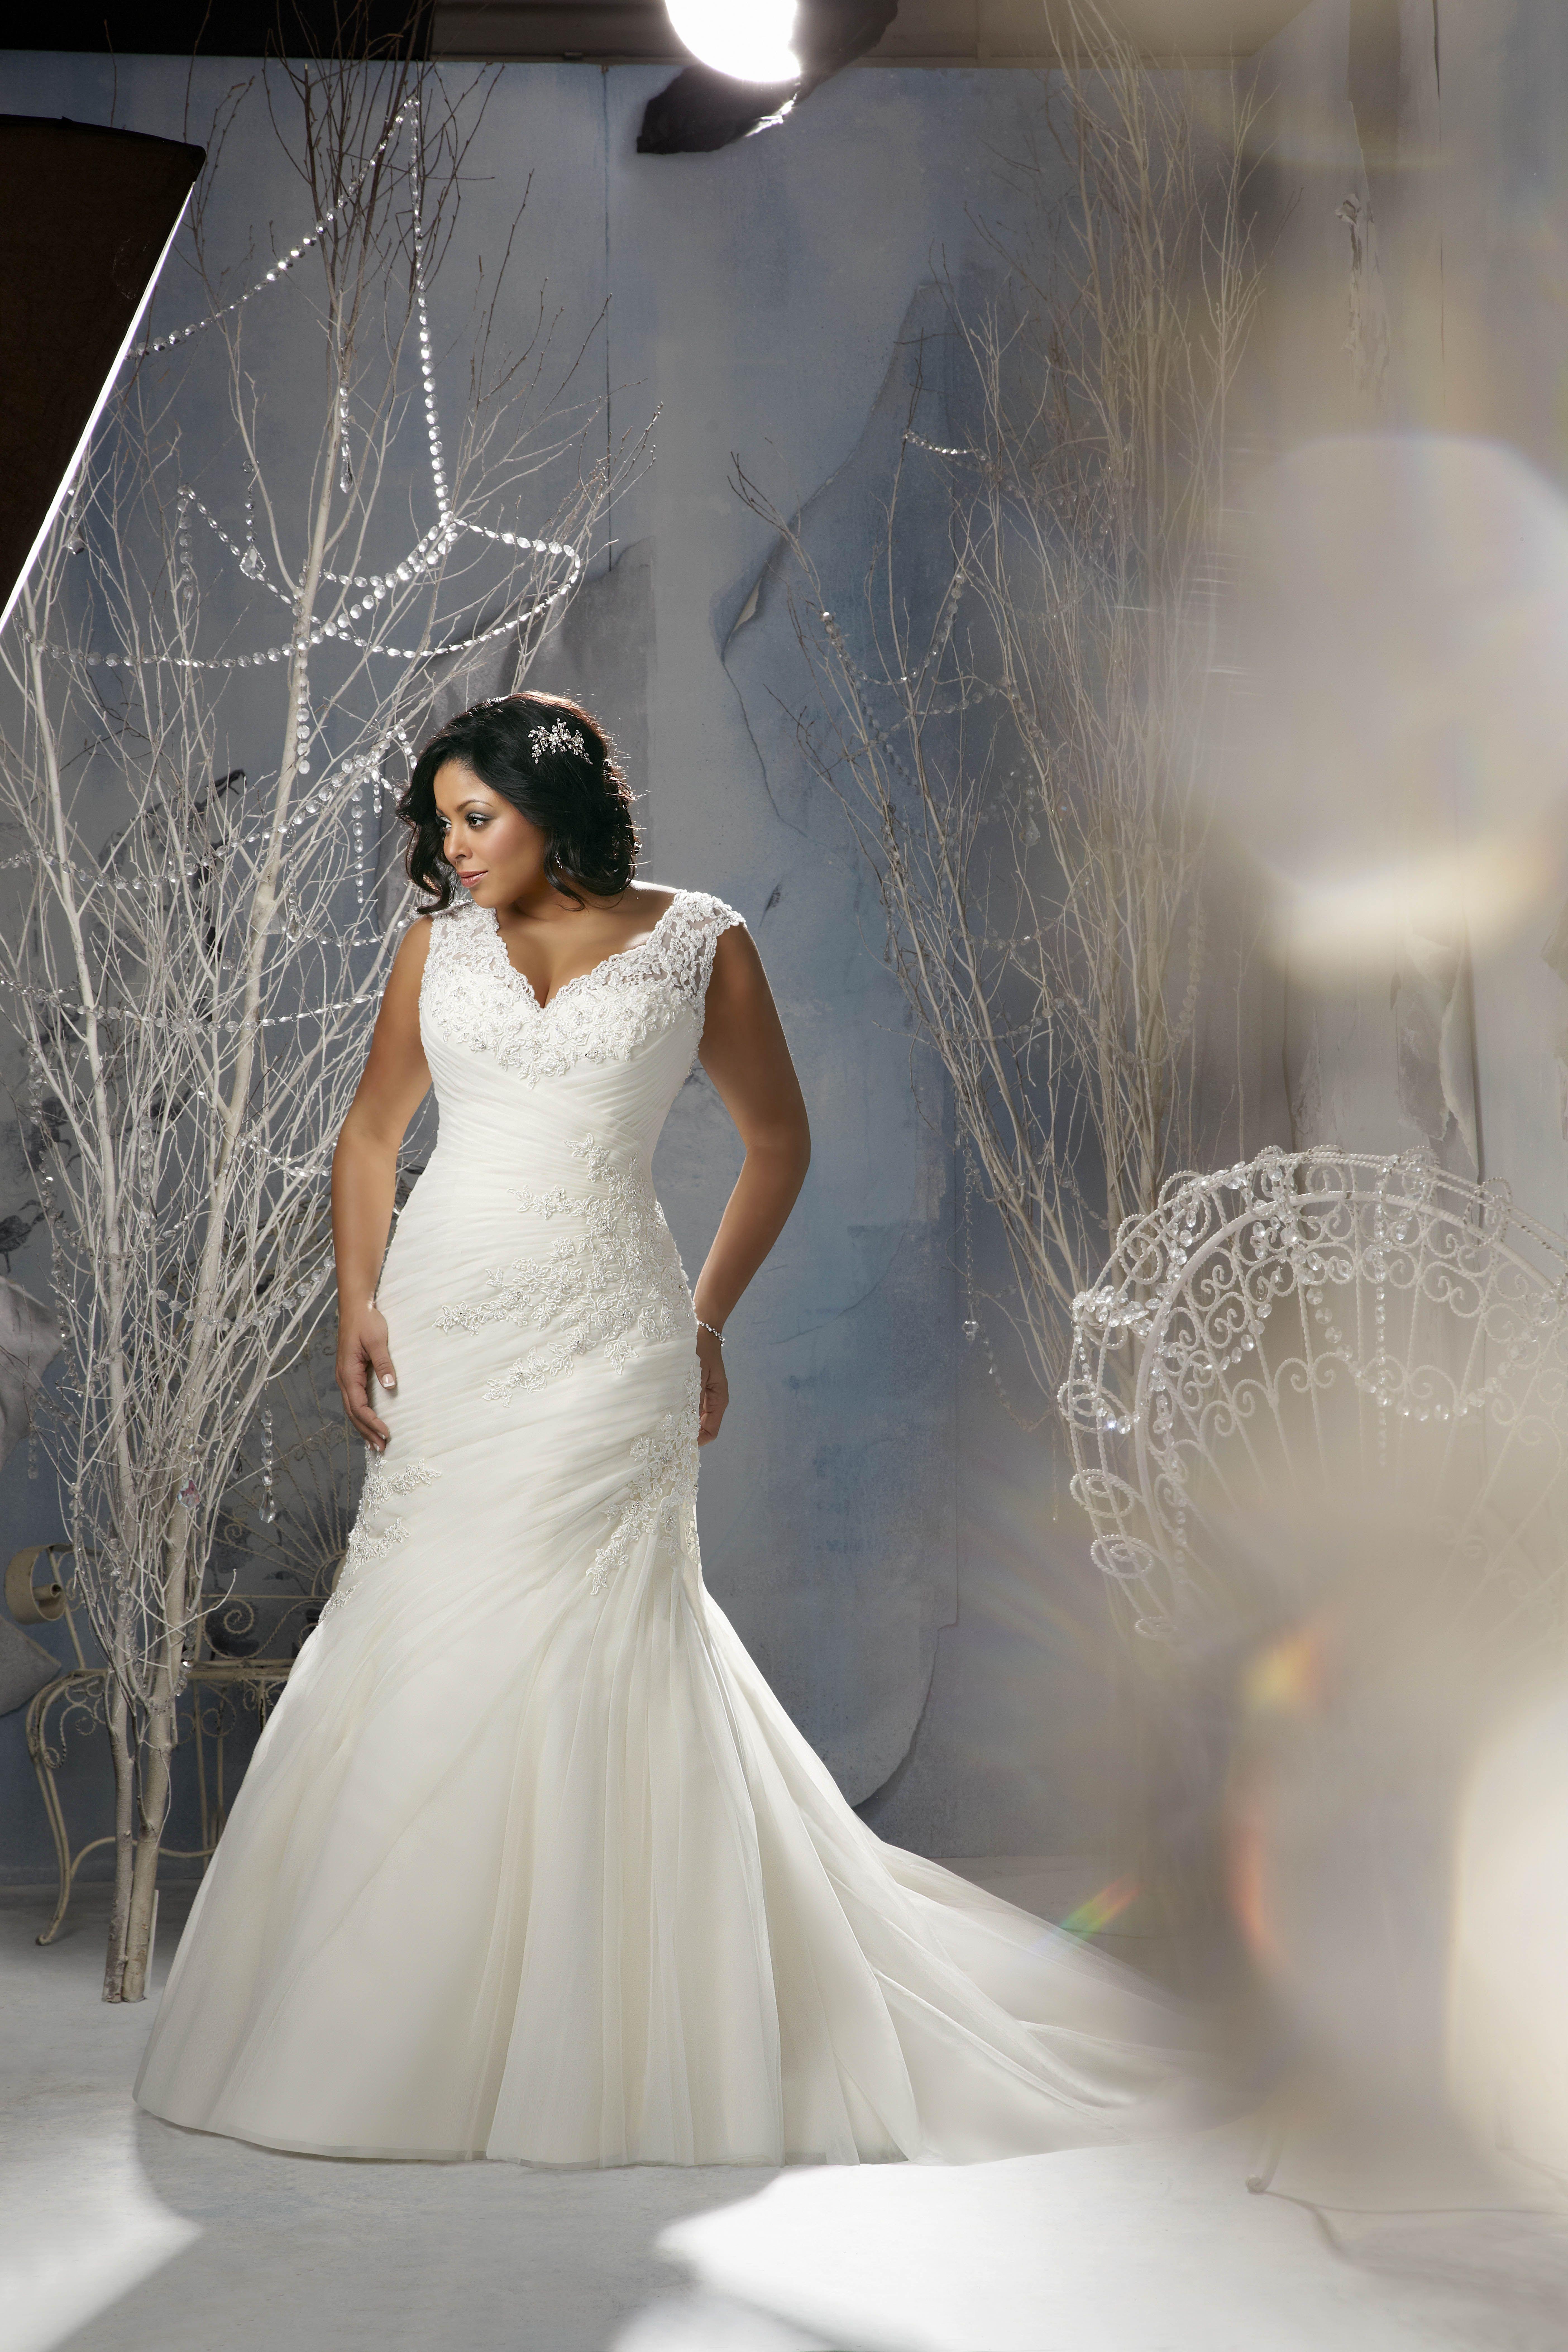 Pin by melissa holloway on weddings n events pinterest wedding